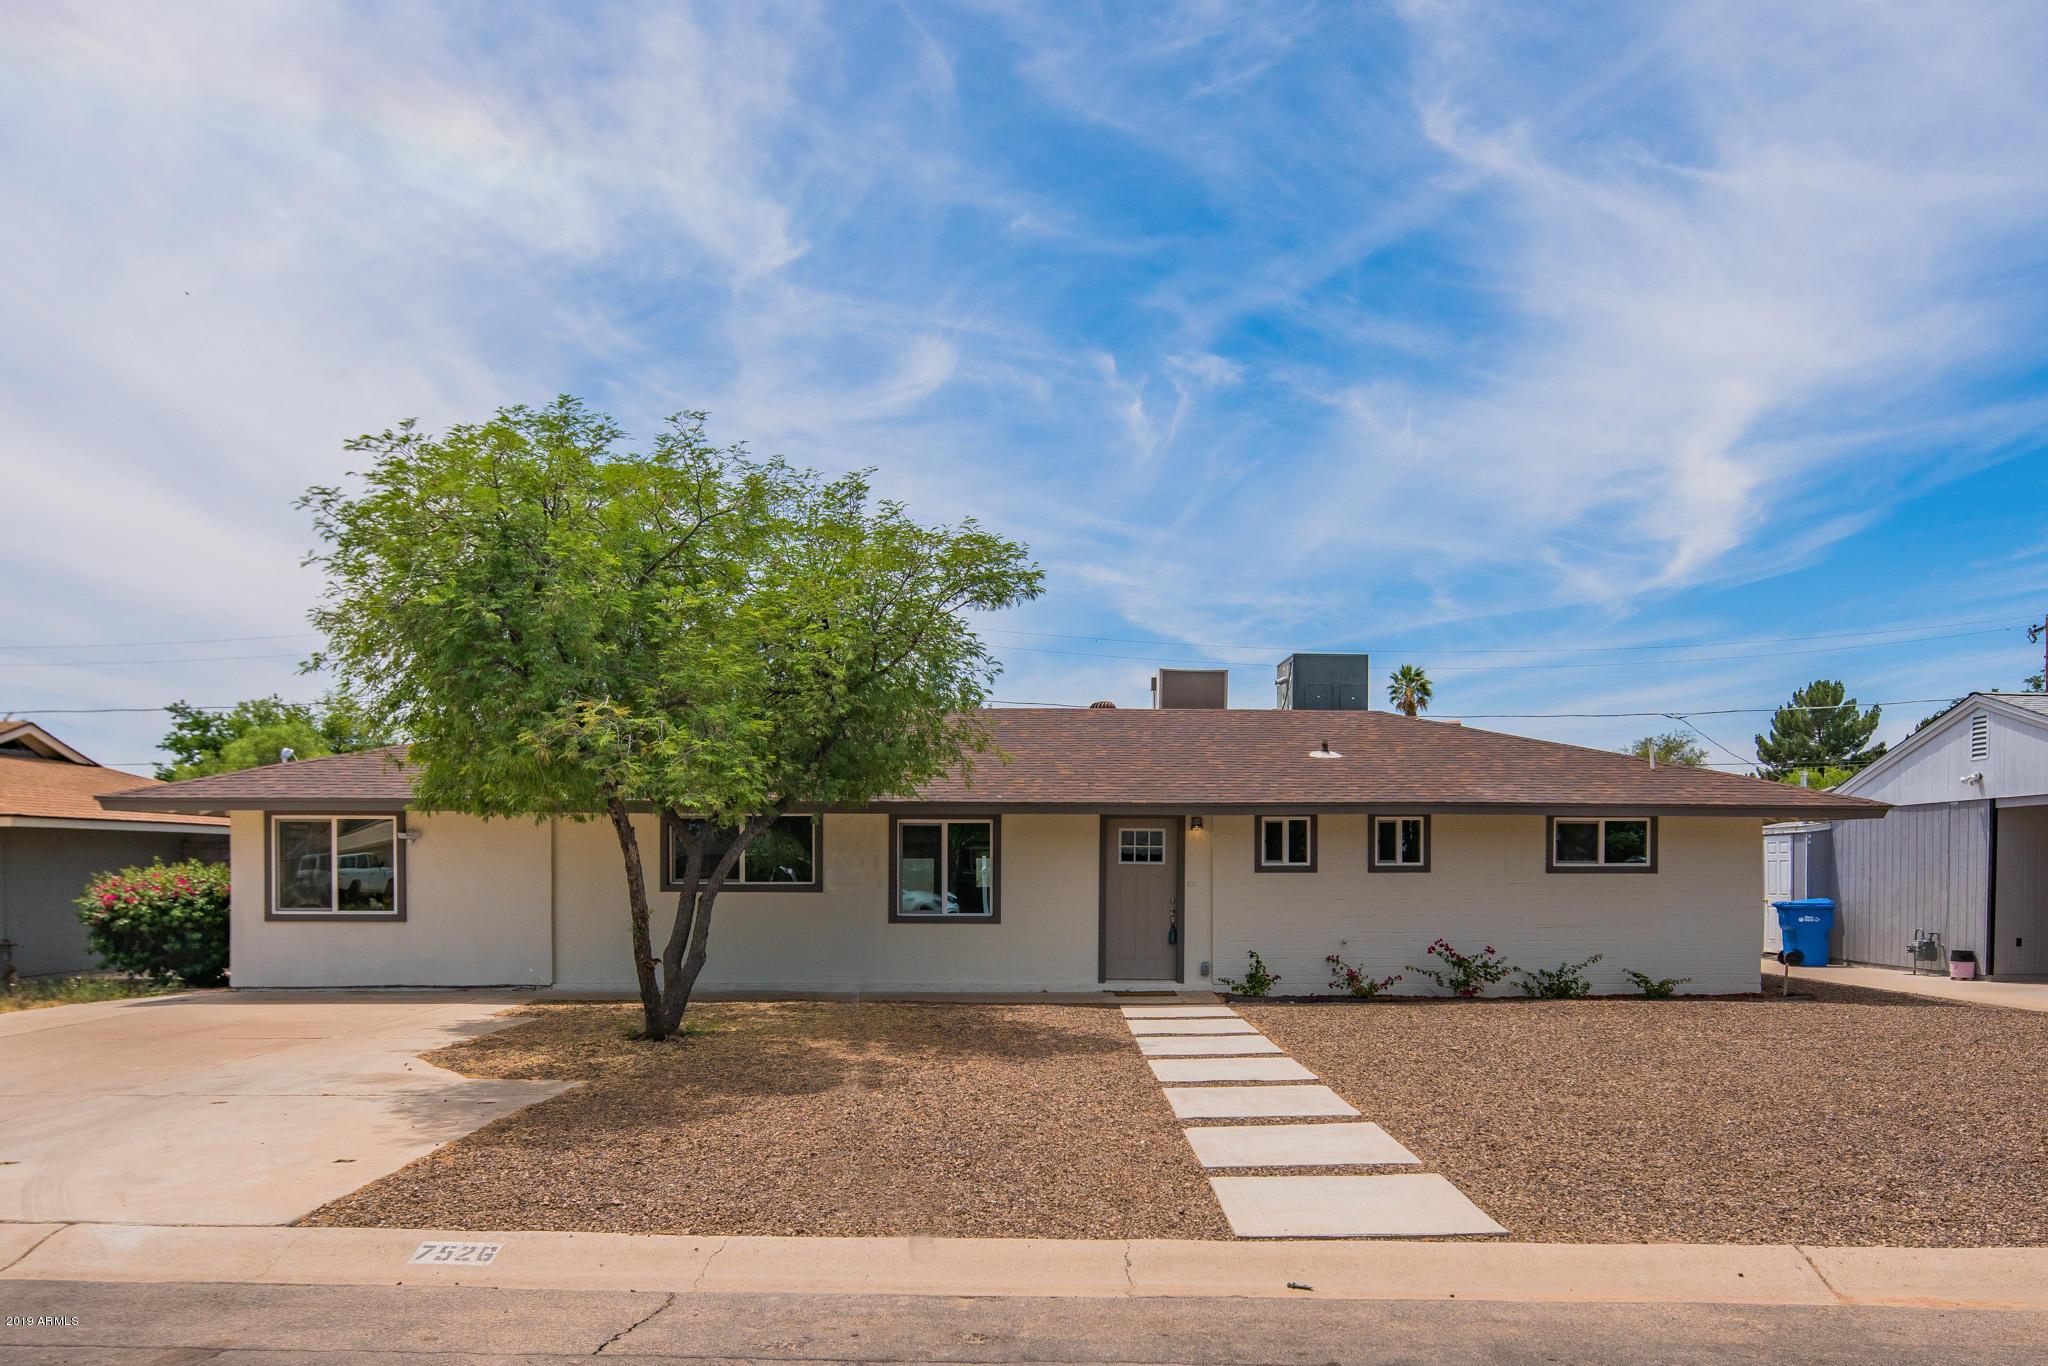 Photo of 7526 N 17TH Avenue, Phoenix, AZ 85021